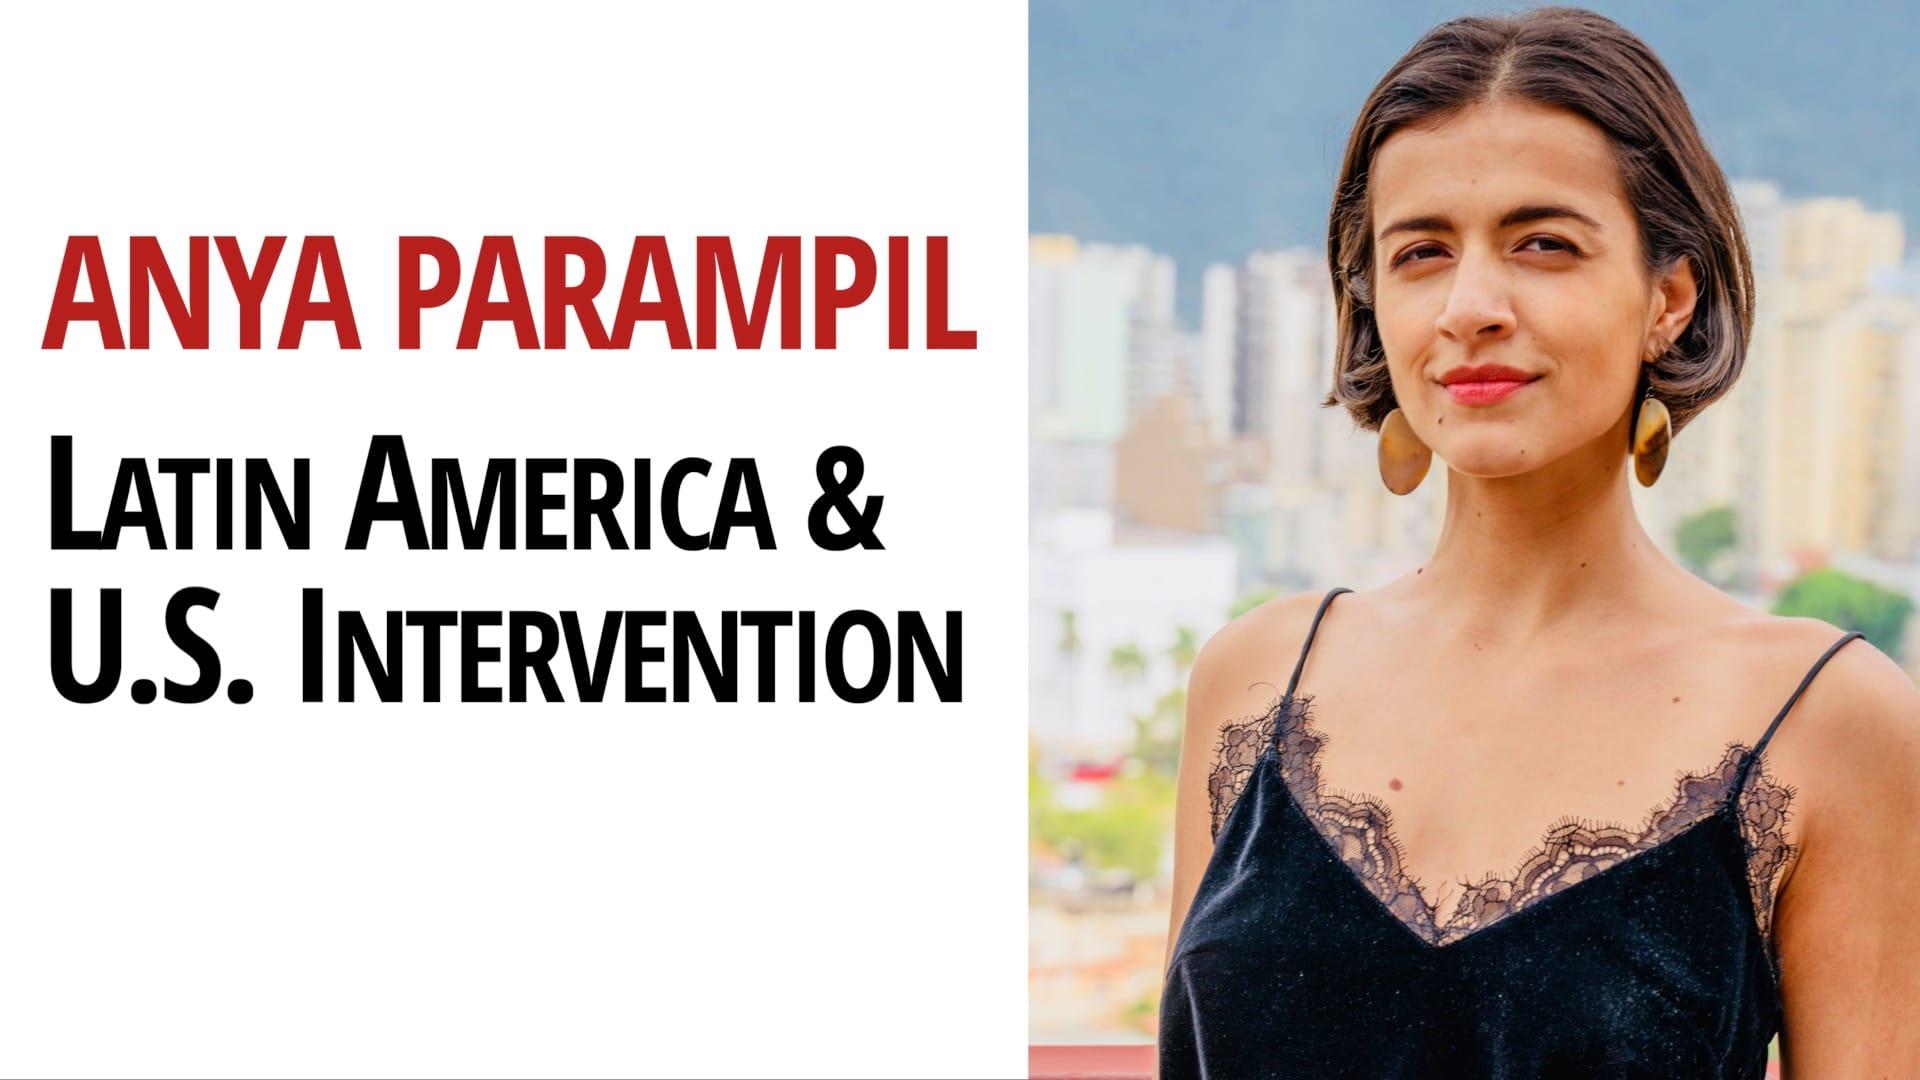 Anya Parampil Bolivia Venezuela U.S. intervention